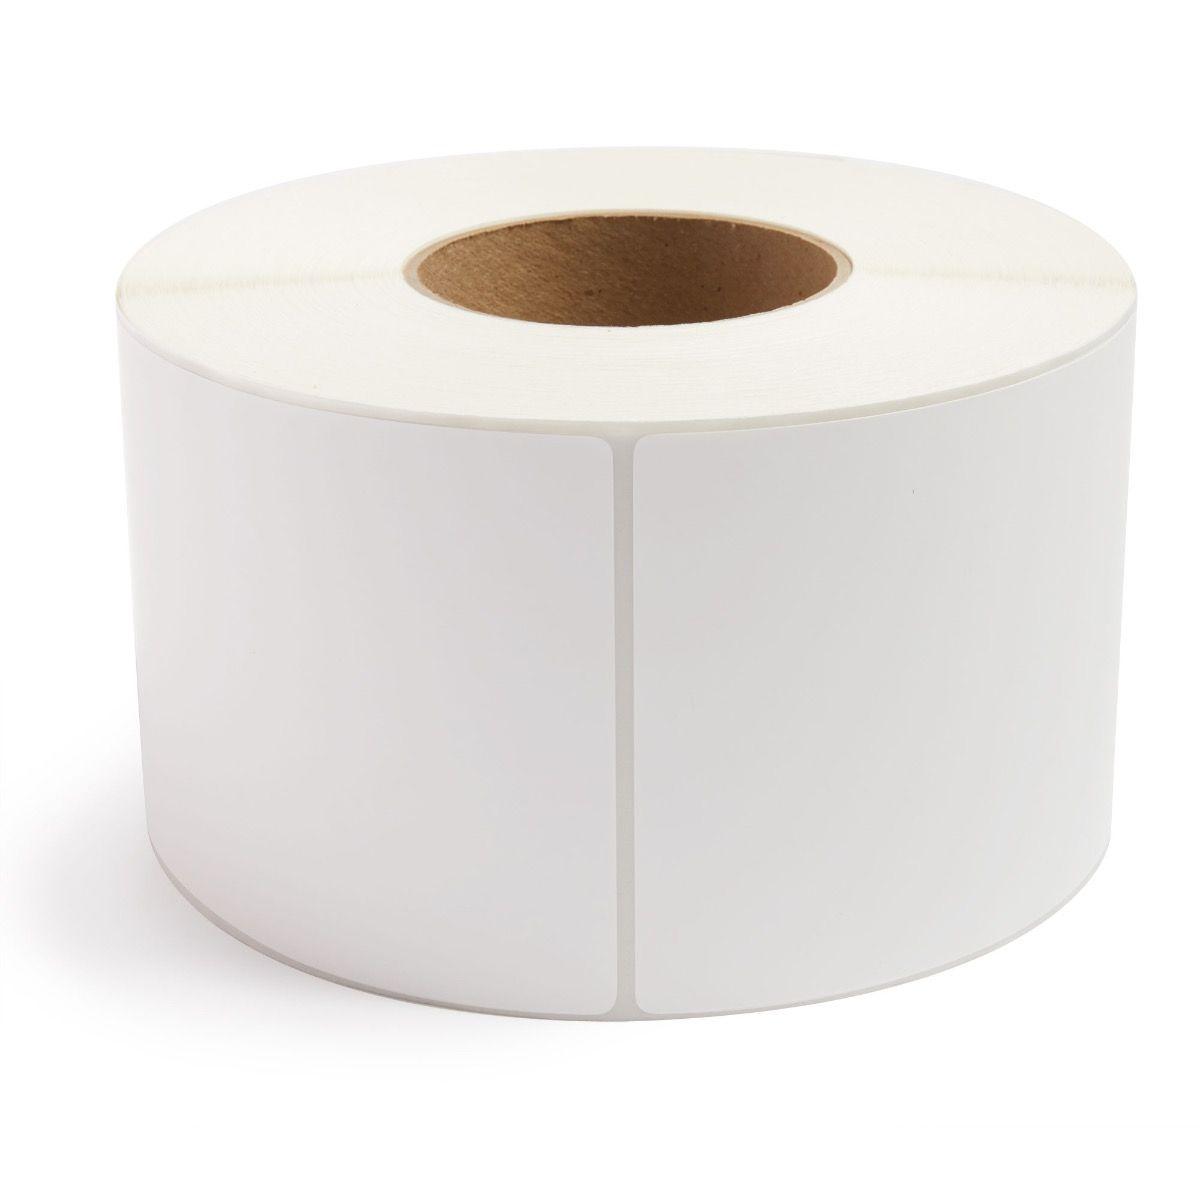 "4"" x 6"" White Matte Paper - Thermal Transfer Labels - 3"" Core"